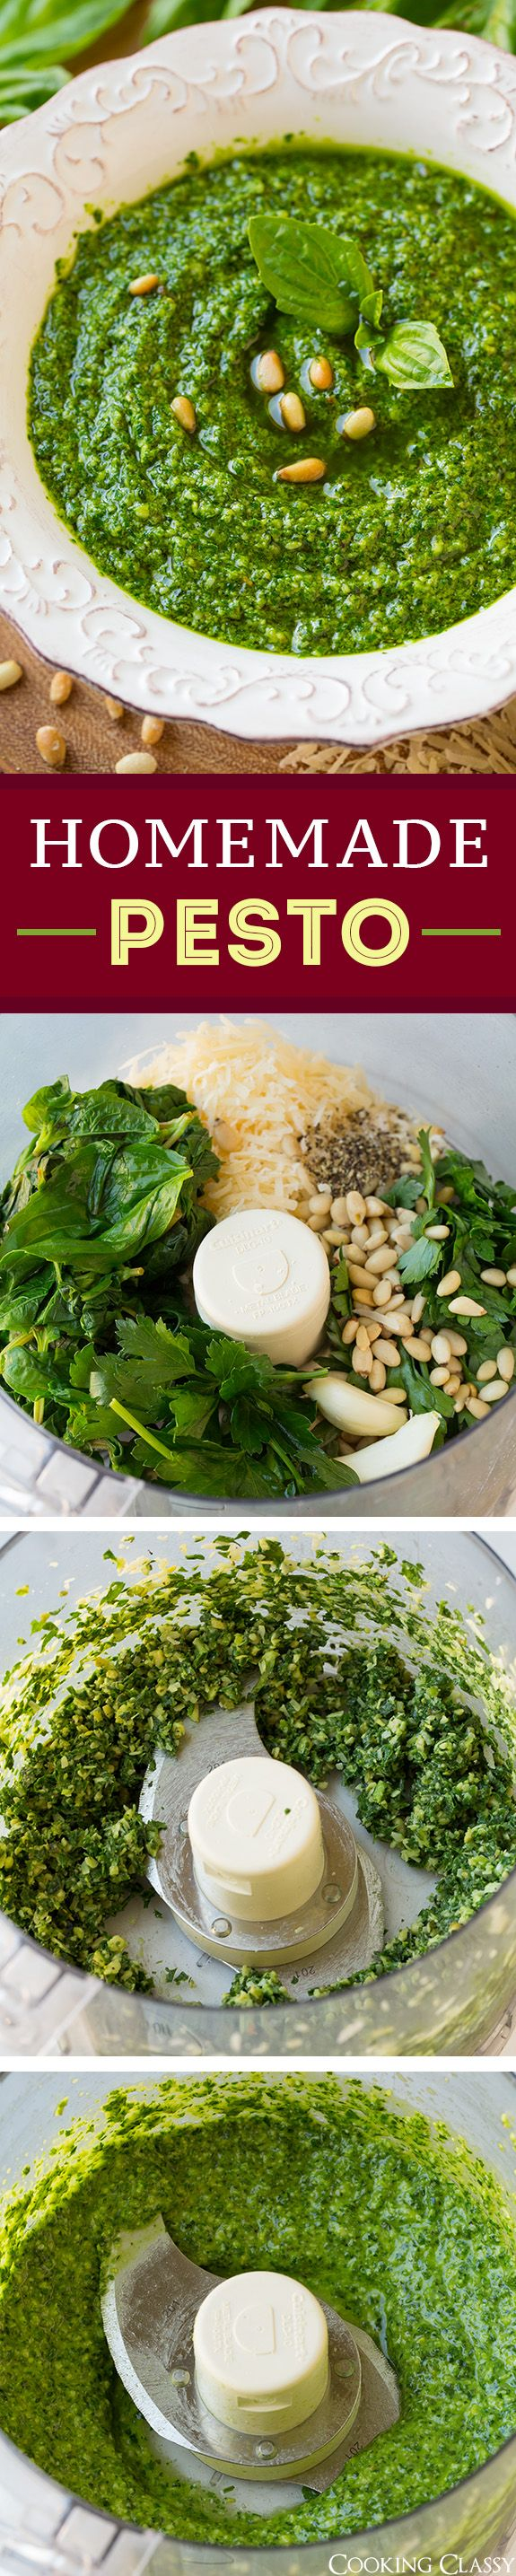 ... ideas about Parsley Pesto on Pinterest | Pesto, Pesto Recipe and Pasta